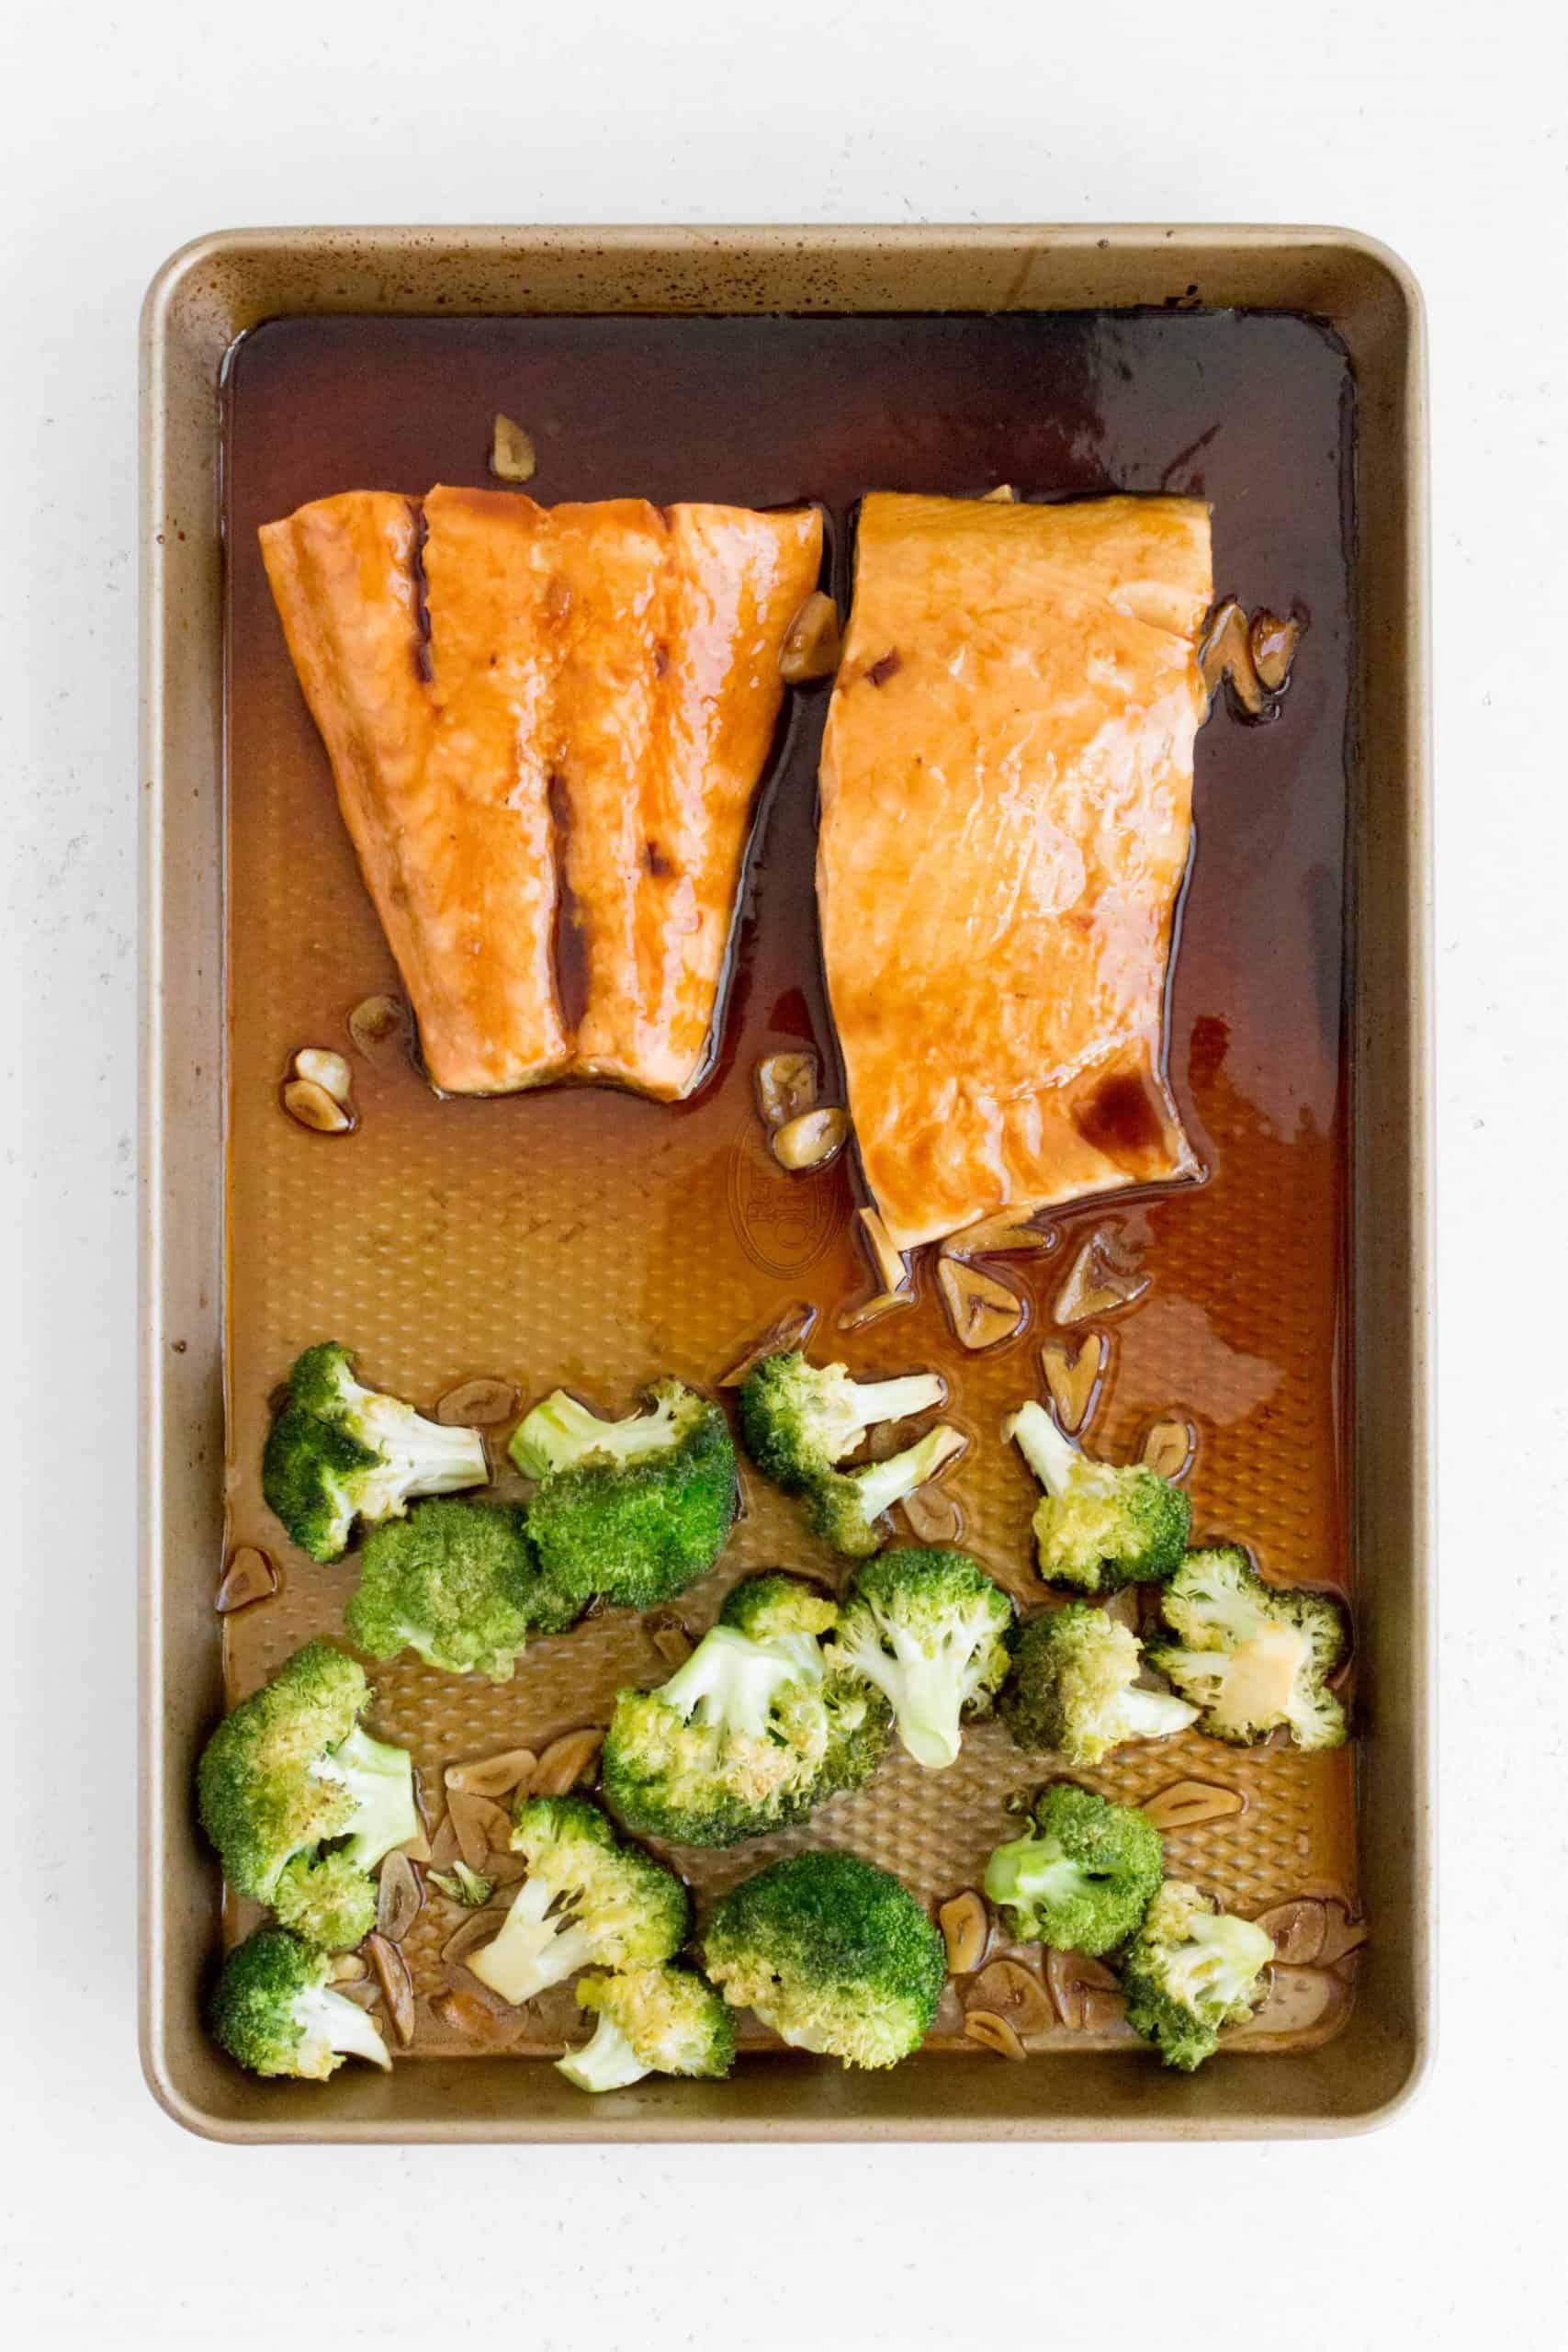 oven baked salmon teriyaki with broccoli in a sheet pan